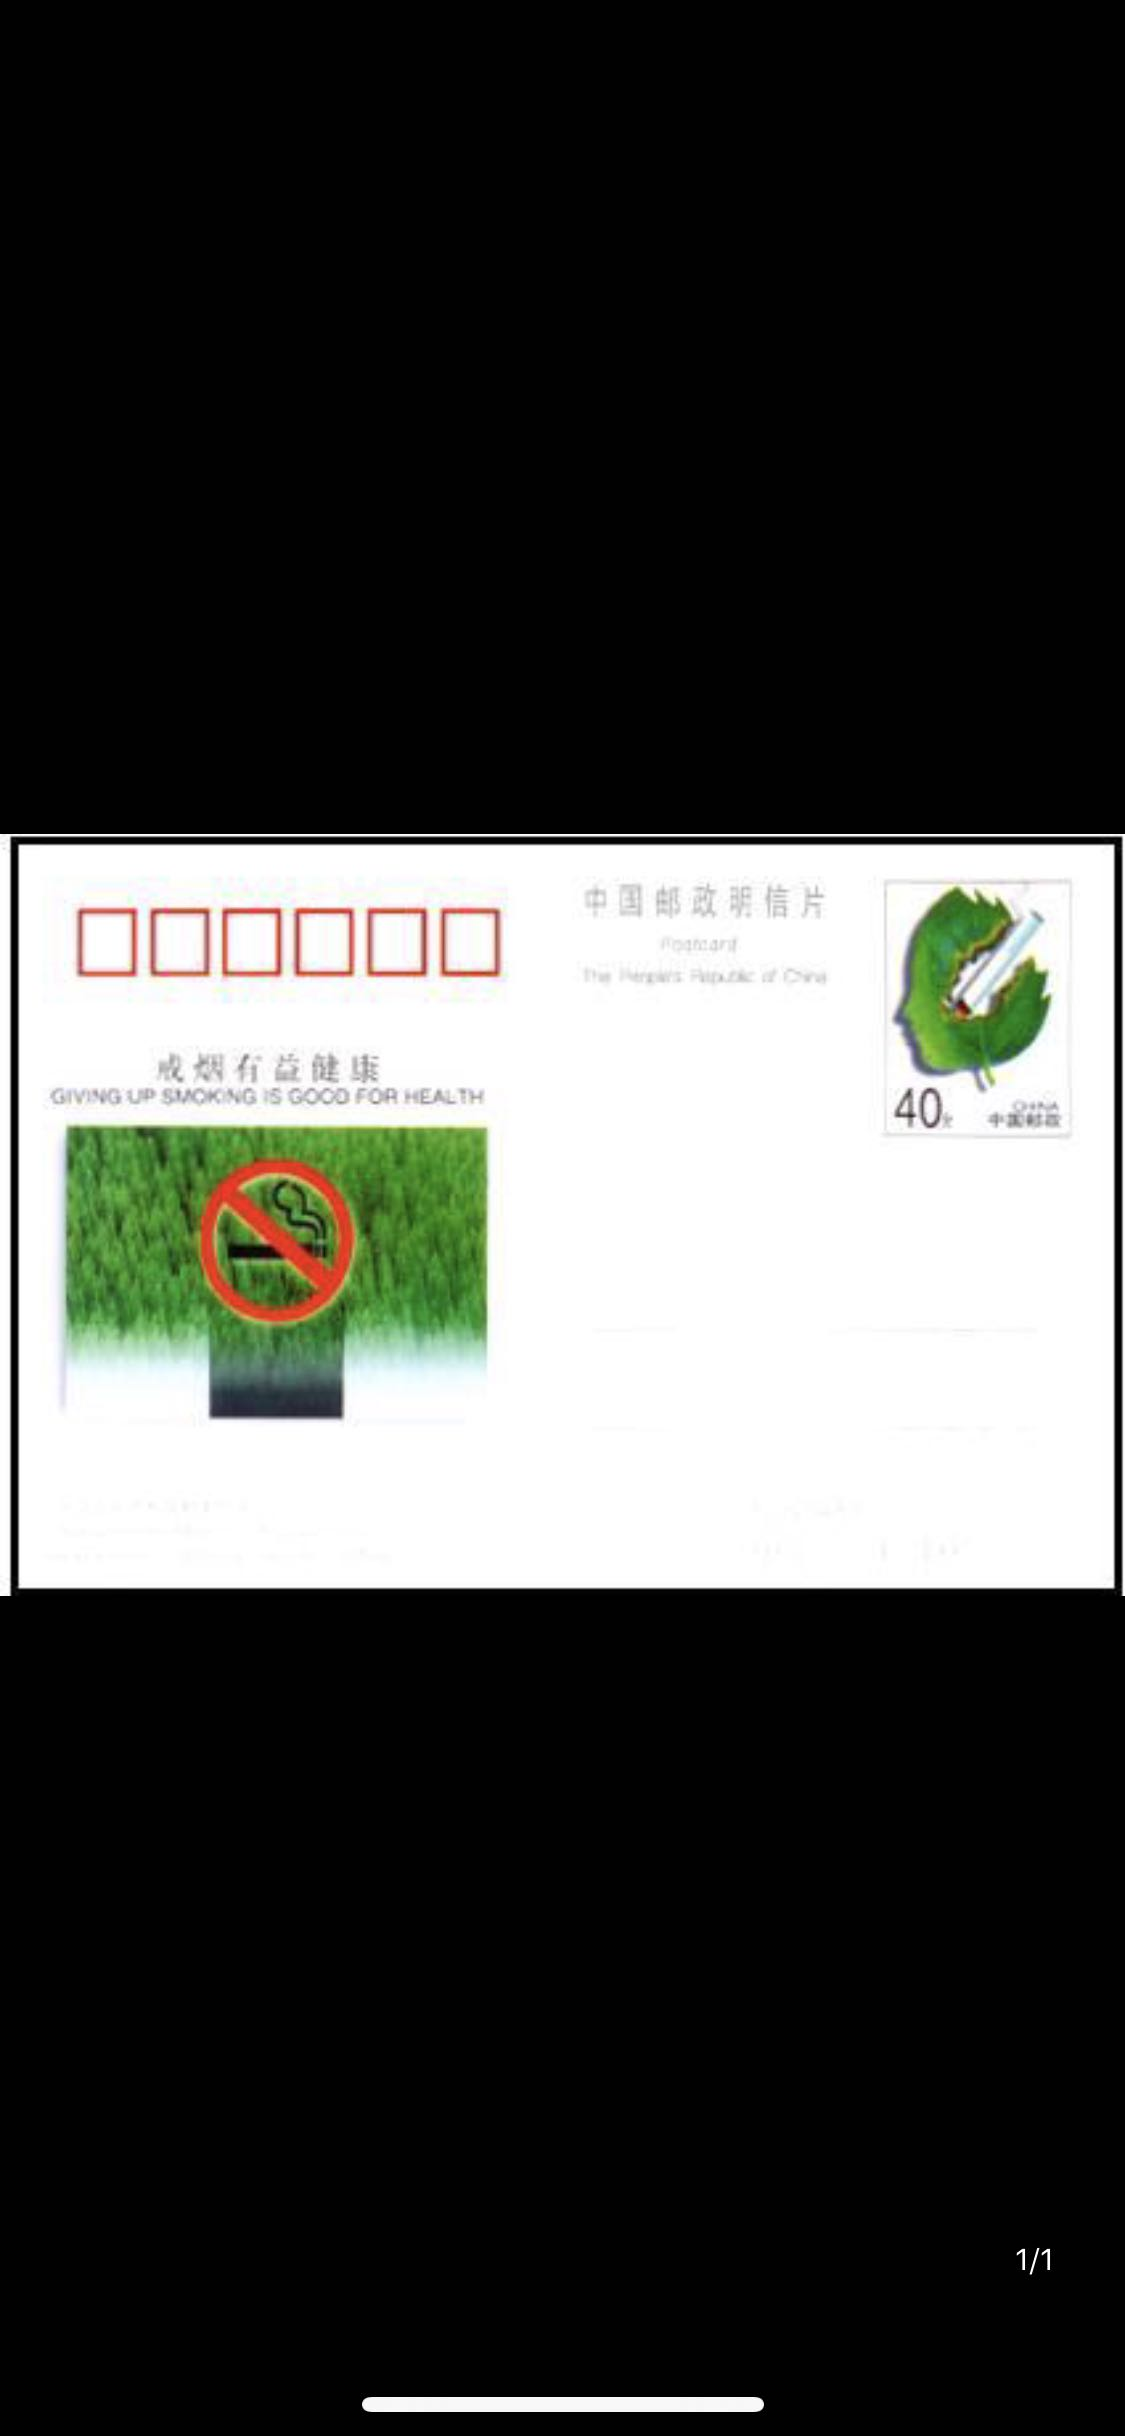 JP61 1997年 戒烟有益健康 纪念邮资明信片 邮资片 明信片 Изображение 1